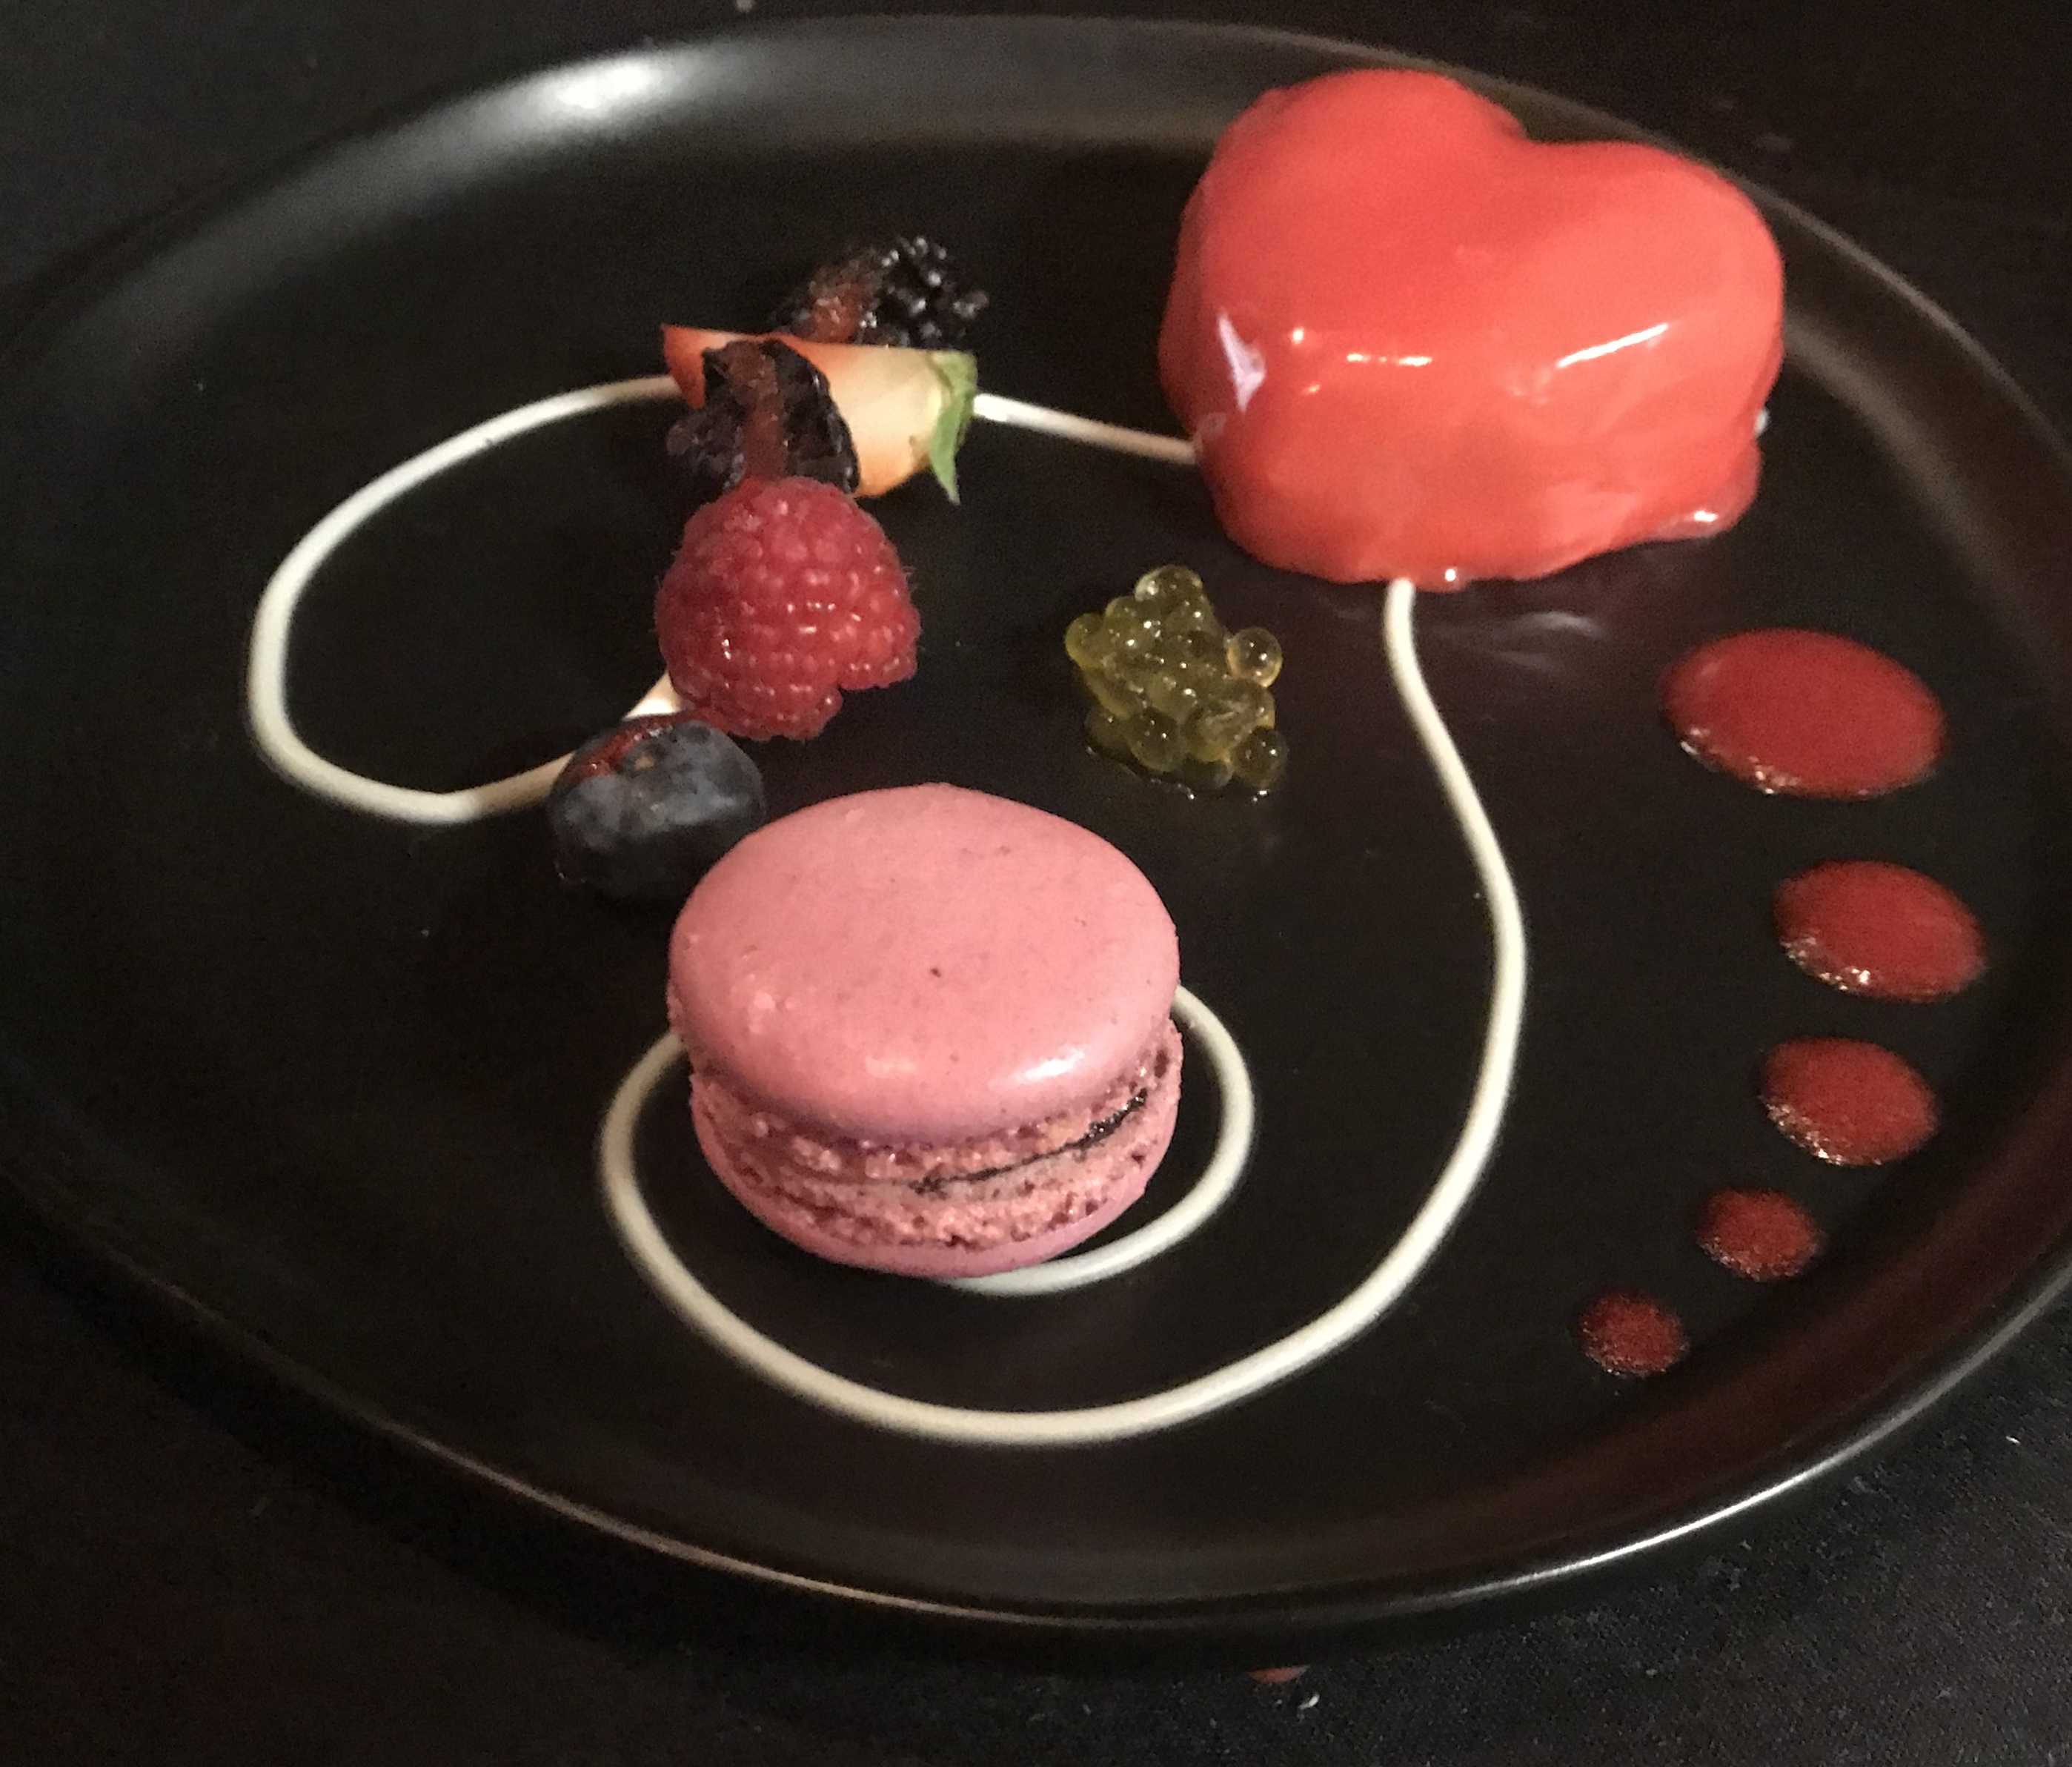 Dark Chocolate & Passion Fruit Mousse